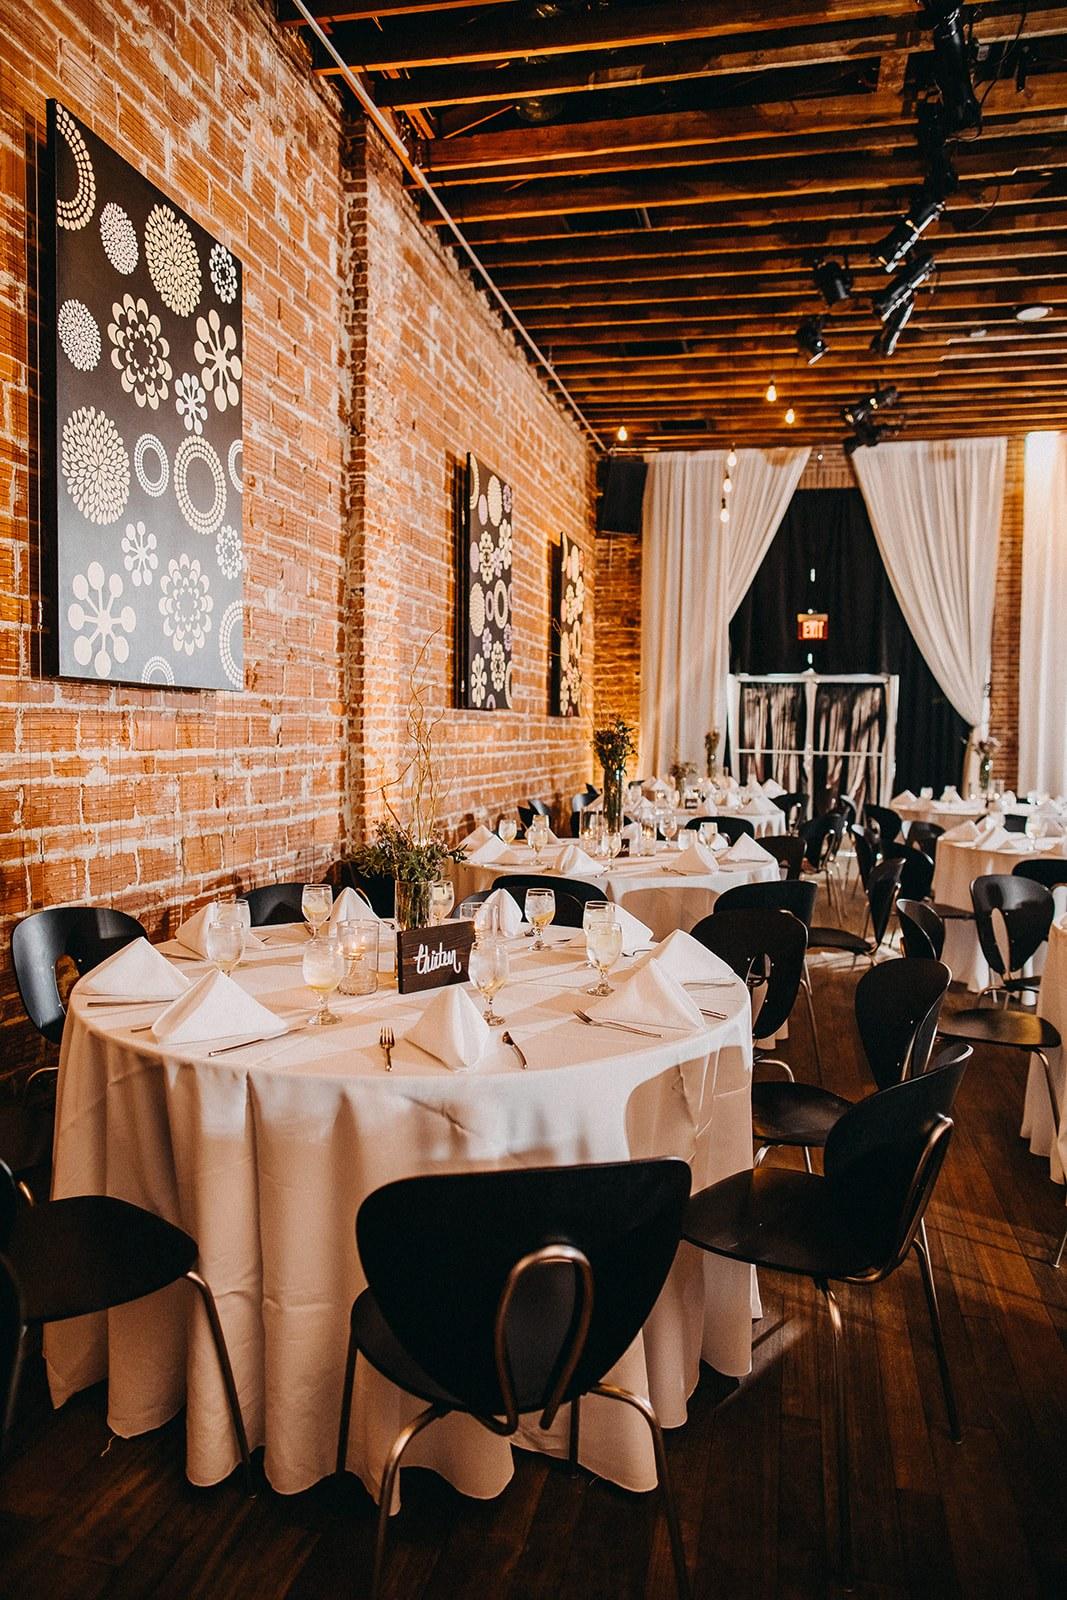 Vintage Inspired Wedding Decor and Reception at Unique St. Pete Wedding Venue NOVA 535 in Tampa Bay